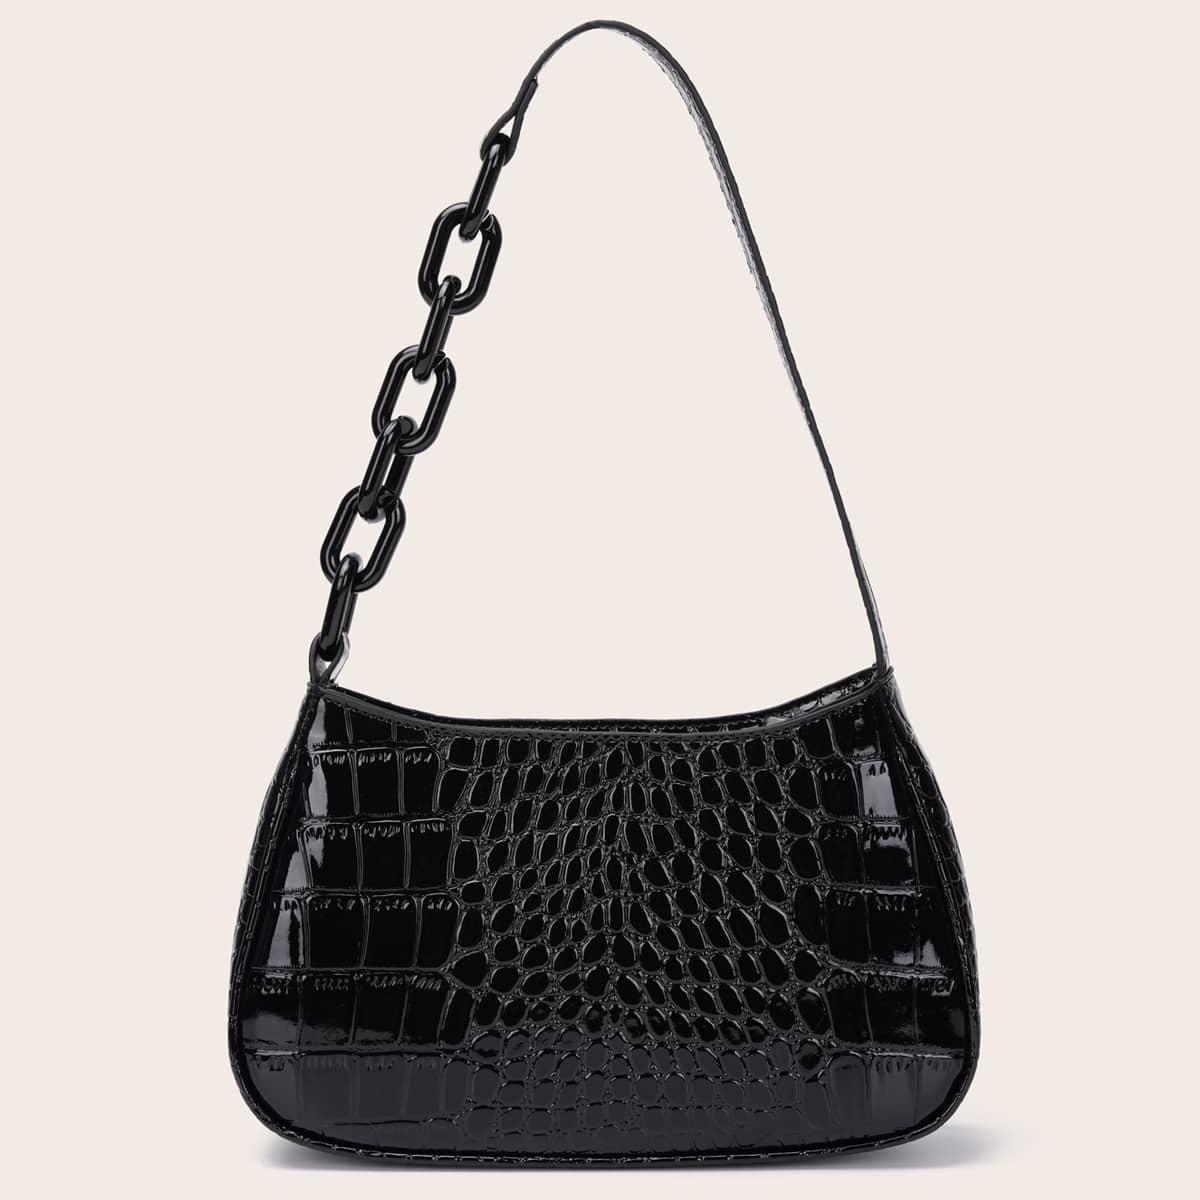 Рельефная сумка-багет